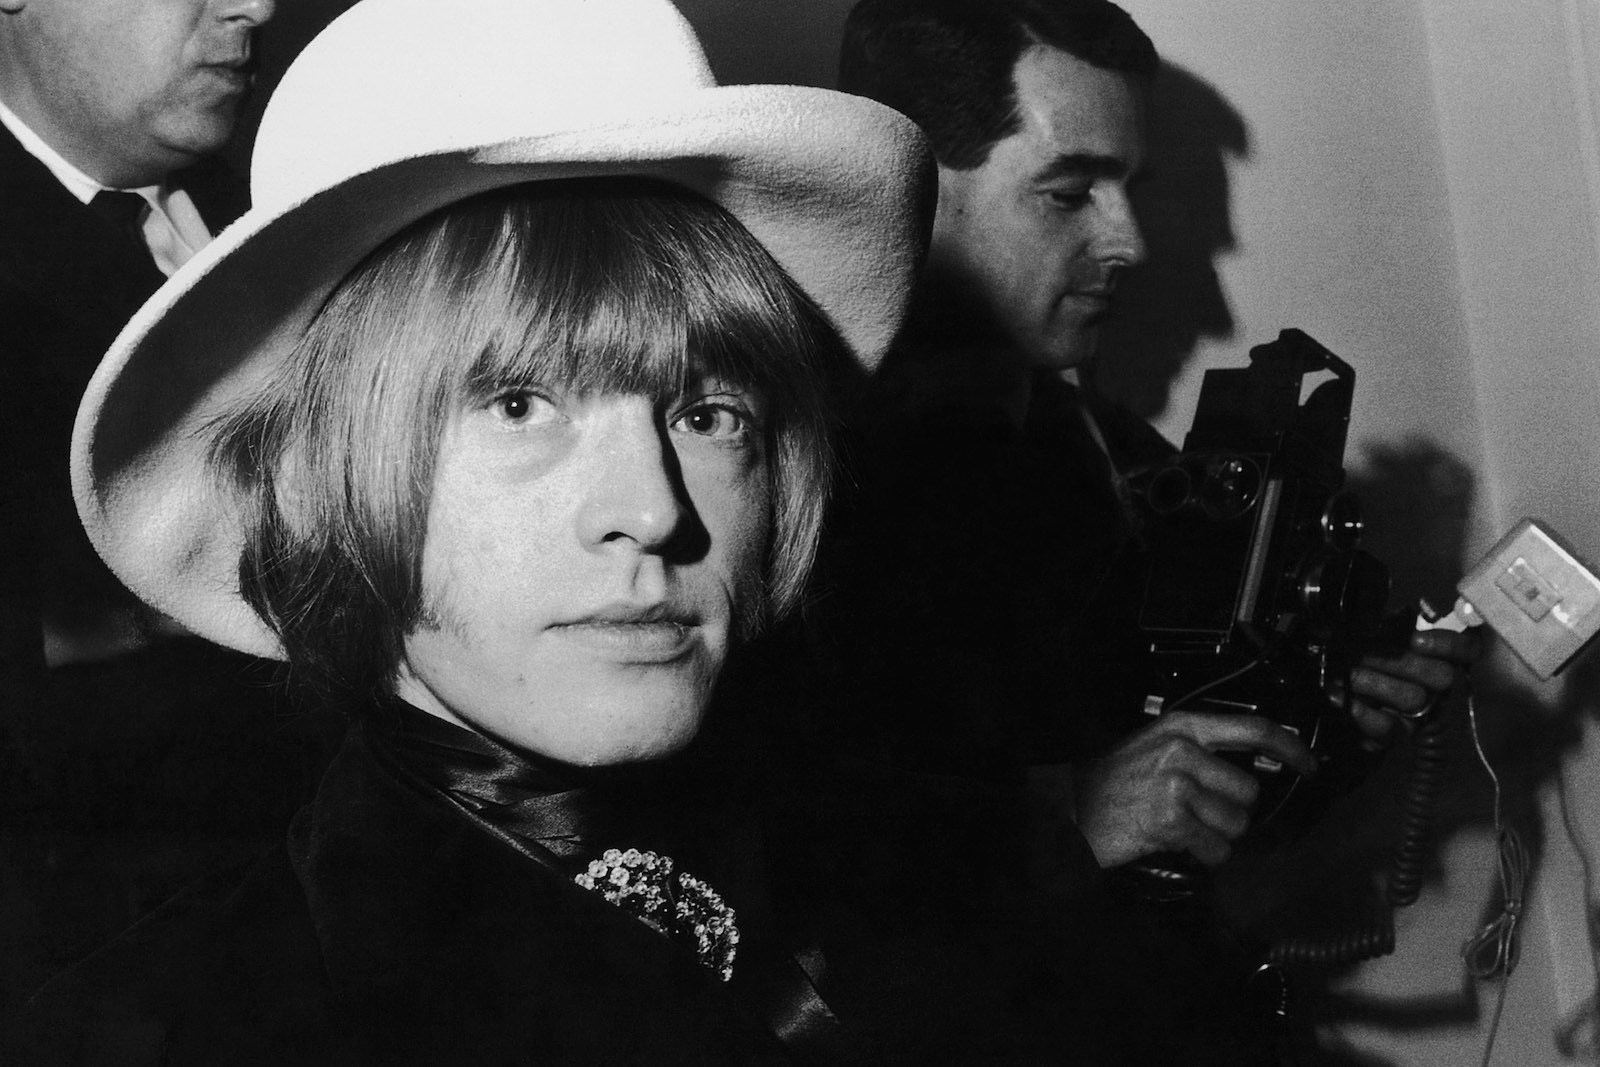 Was Rolling Stones Co-Founder Brian Jones Murdered?